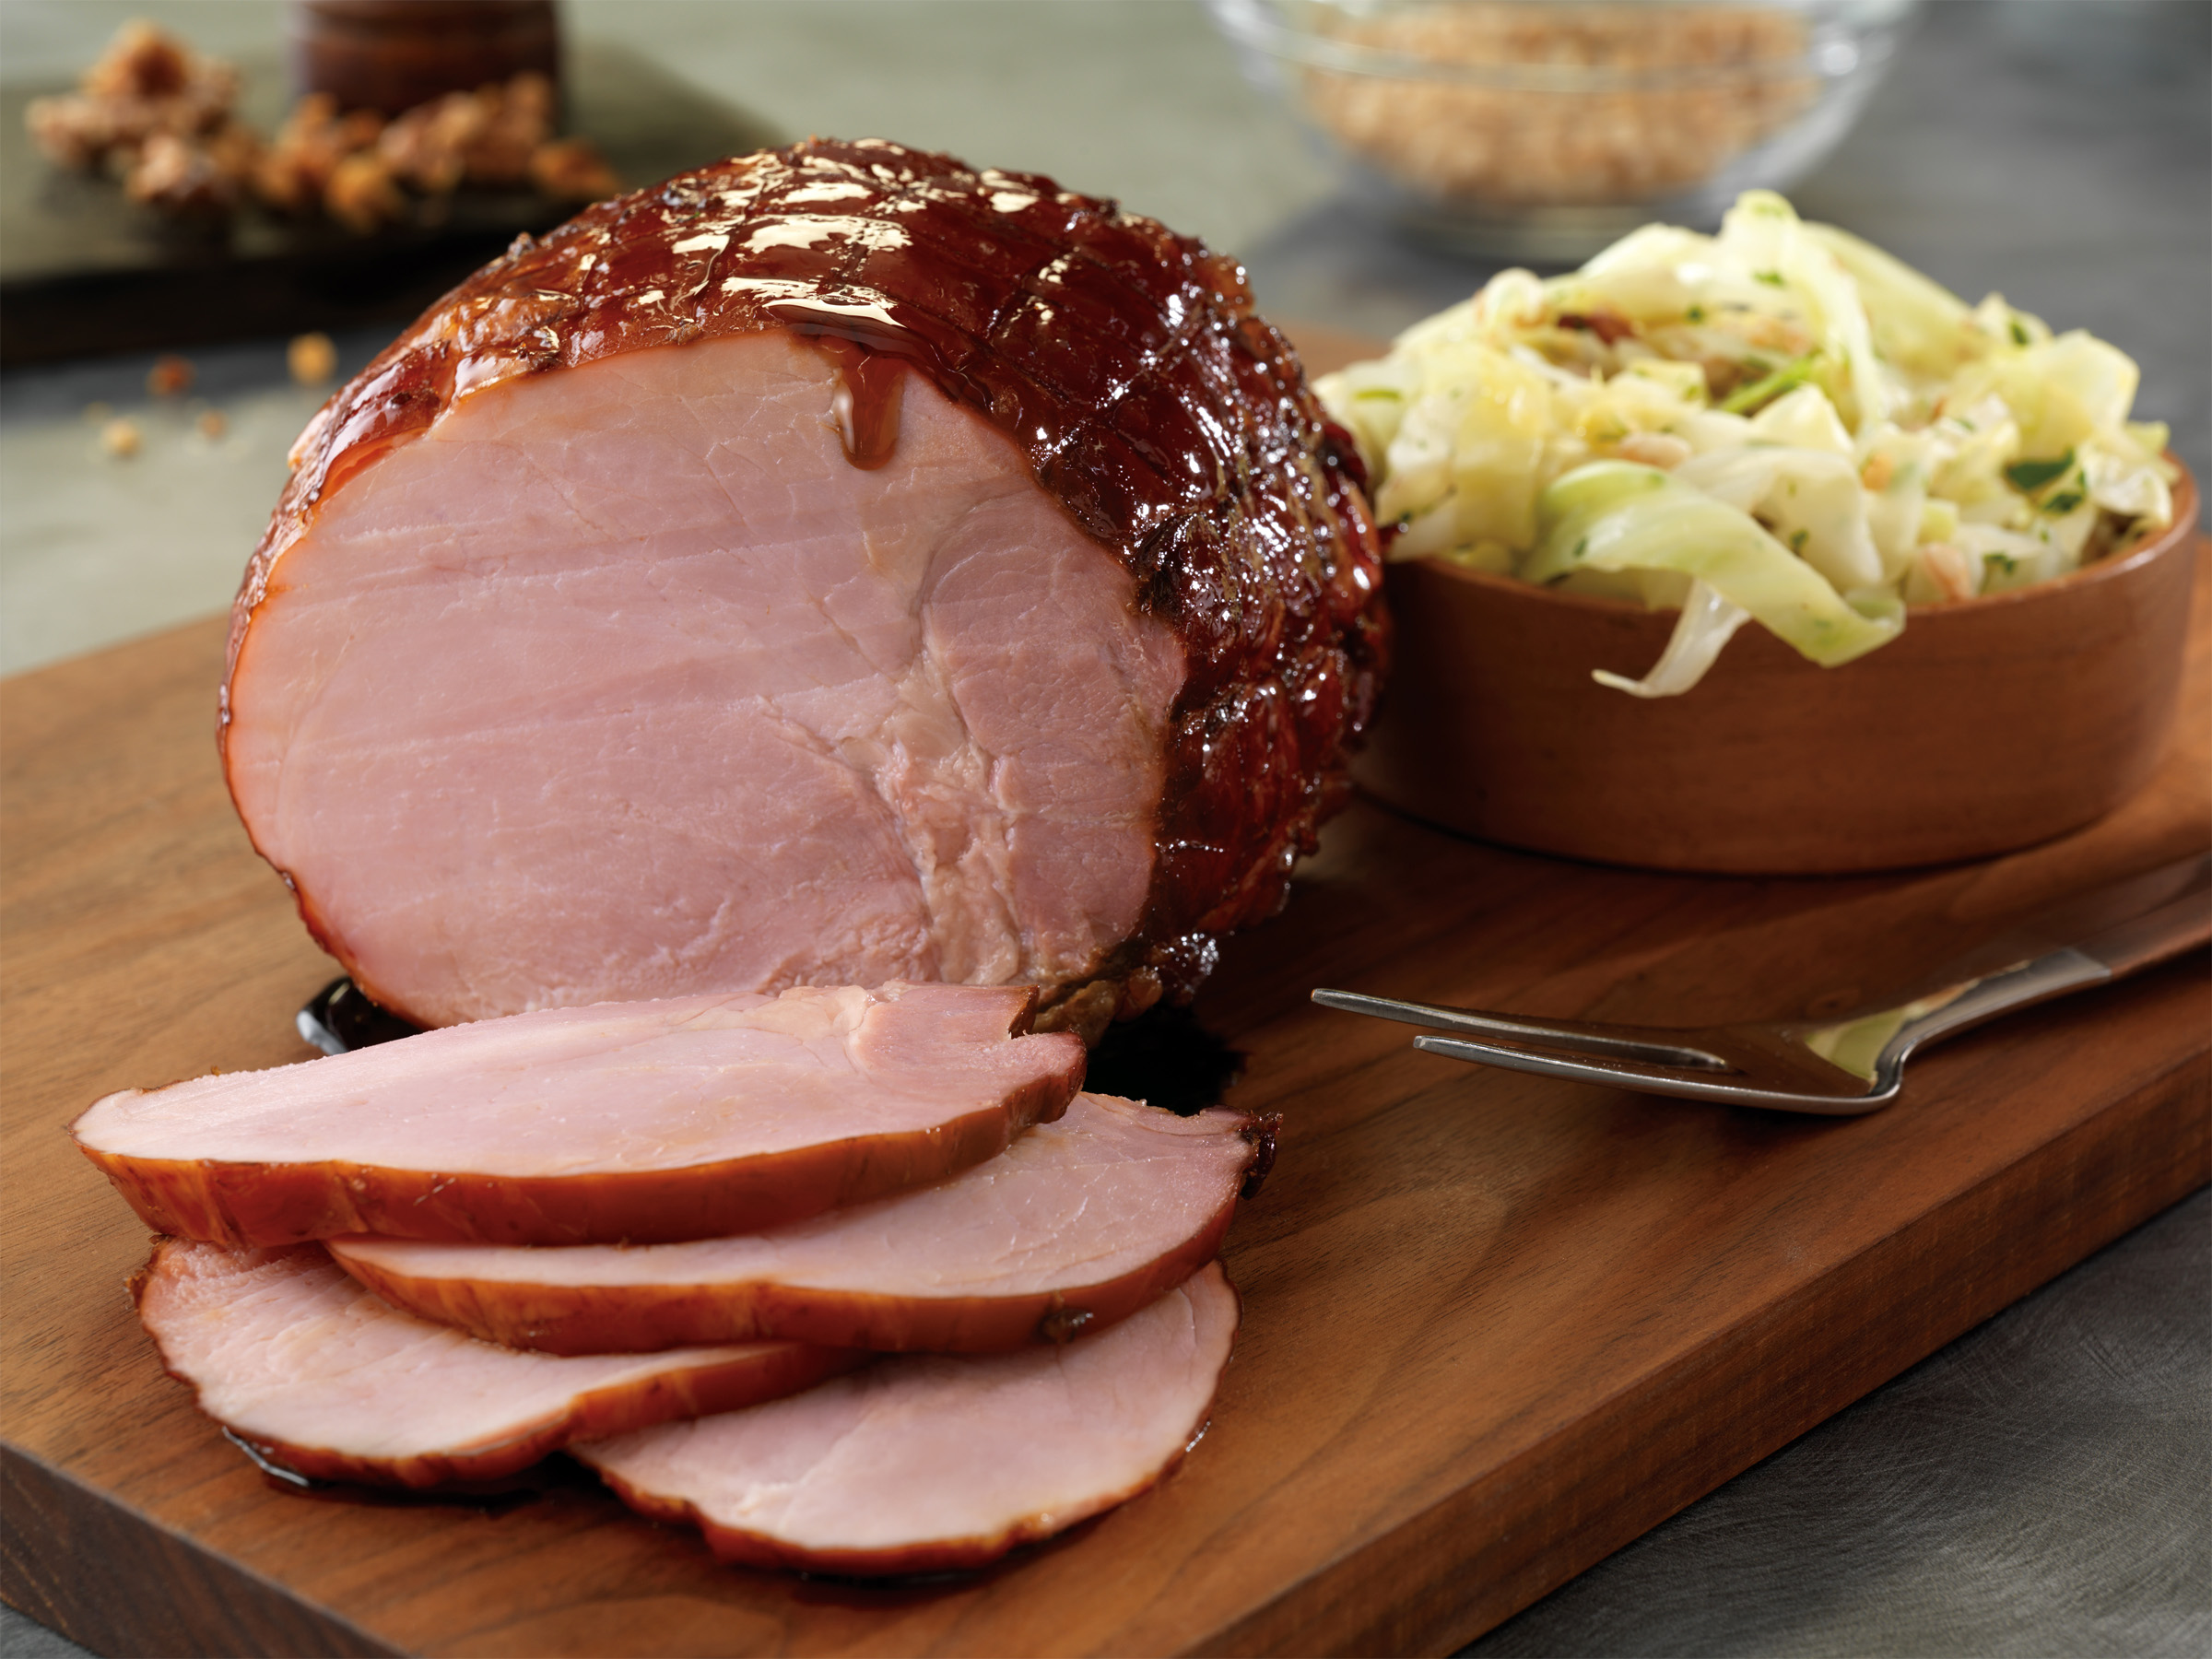 Kenali 5 Bagian Daging Babi Yang Dapat Merubah Rasa Makanan